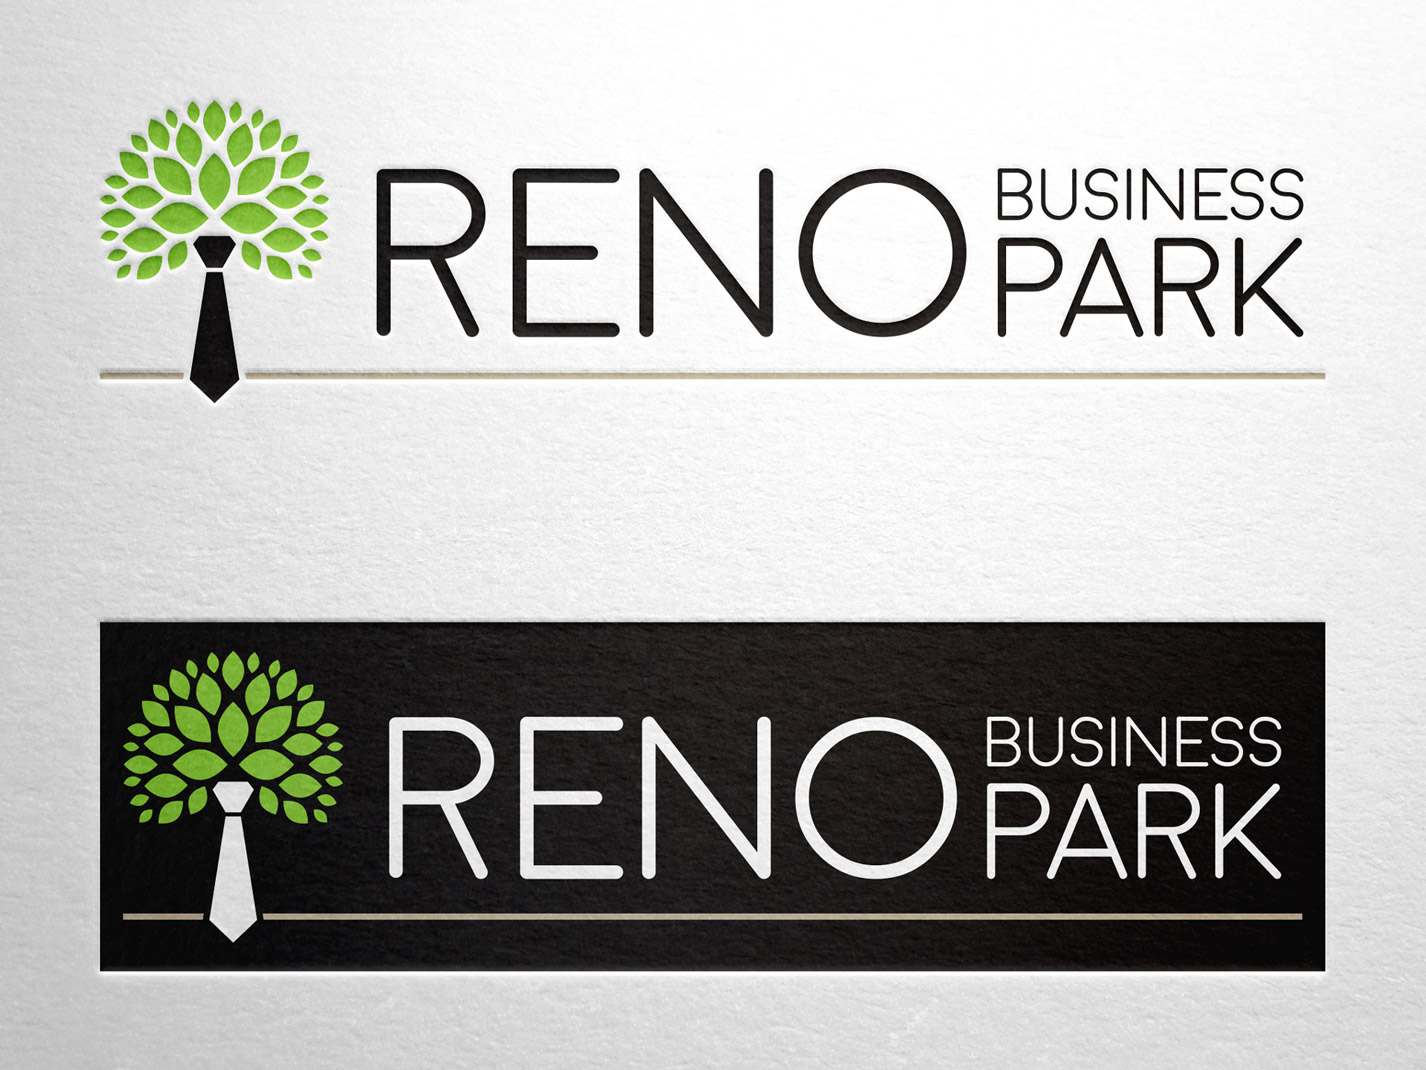 Reno Business Park Branding & Signage